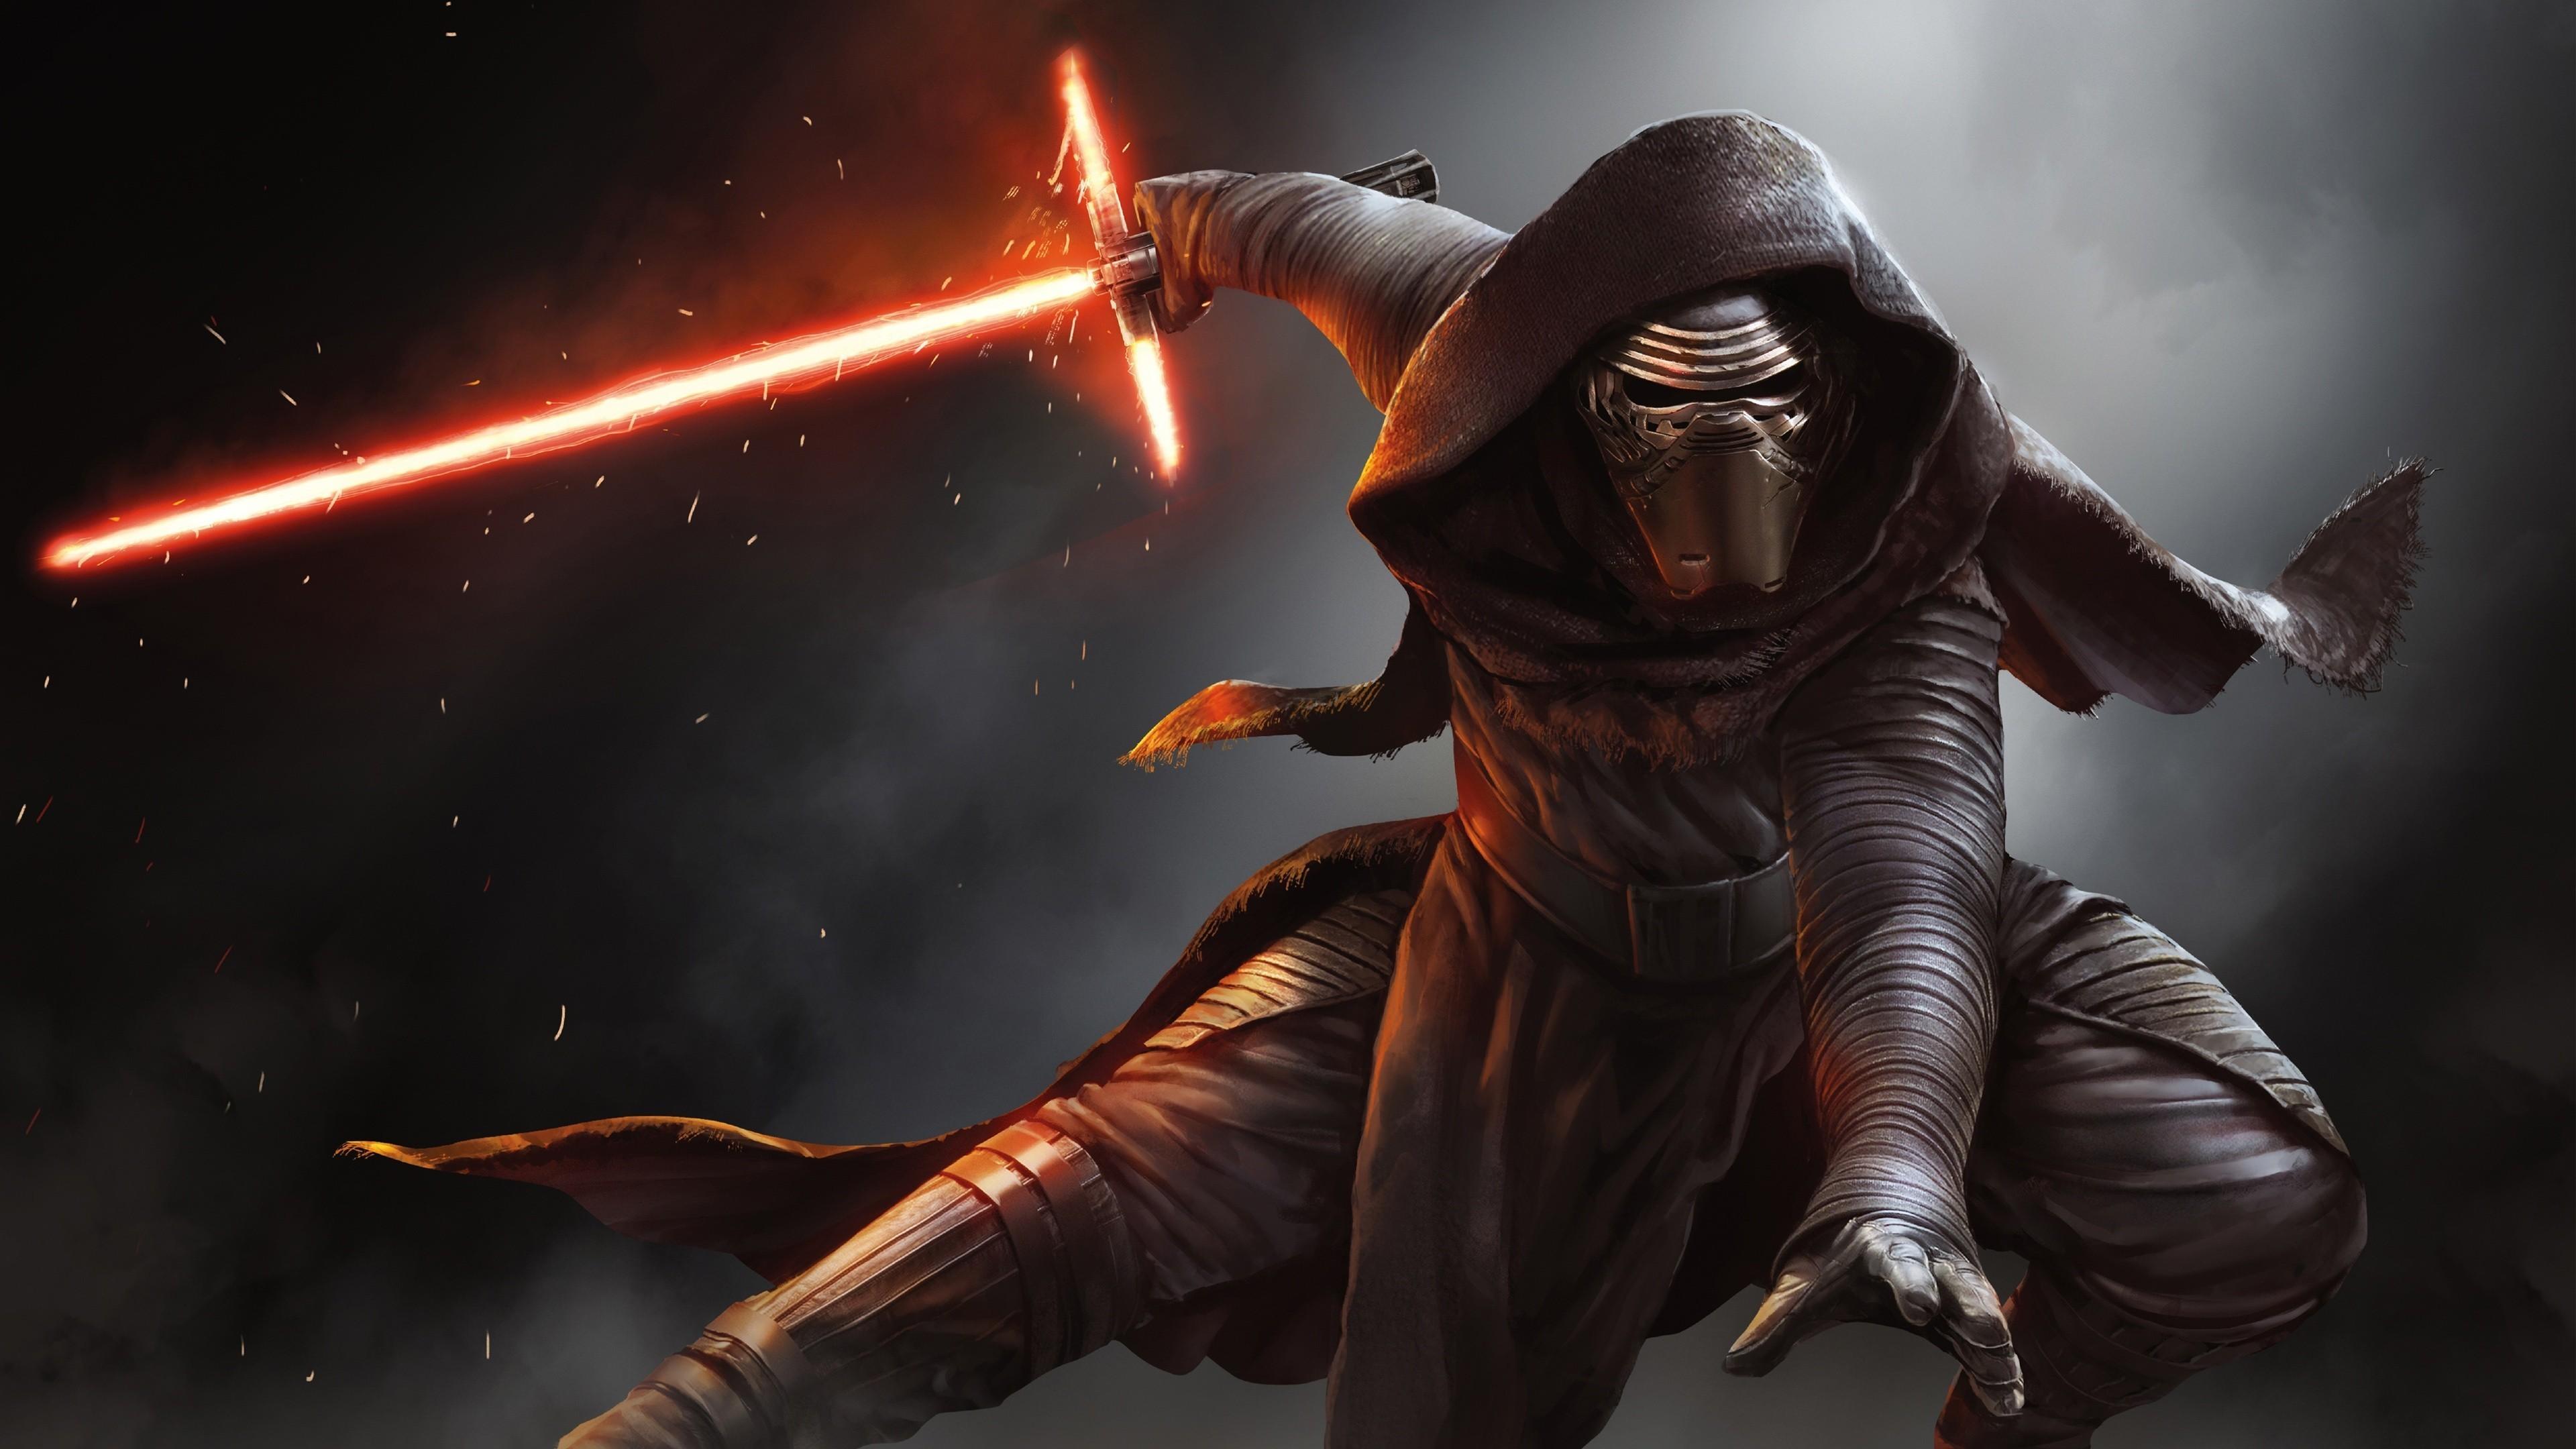 Star Wars Episode VII: The Force Awakens, Kylo Ren movie poster